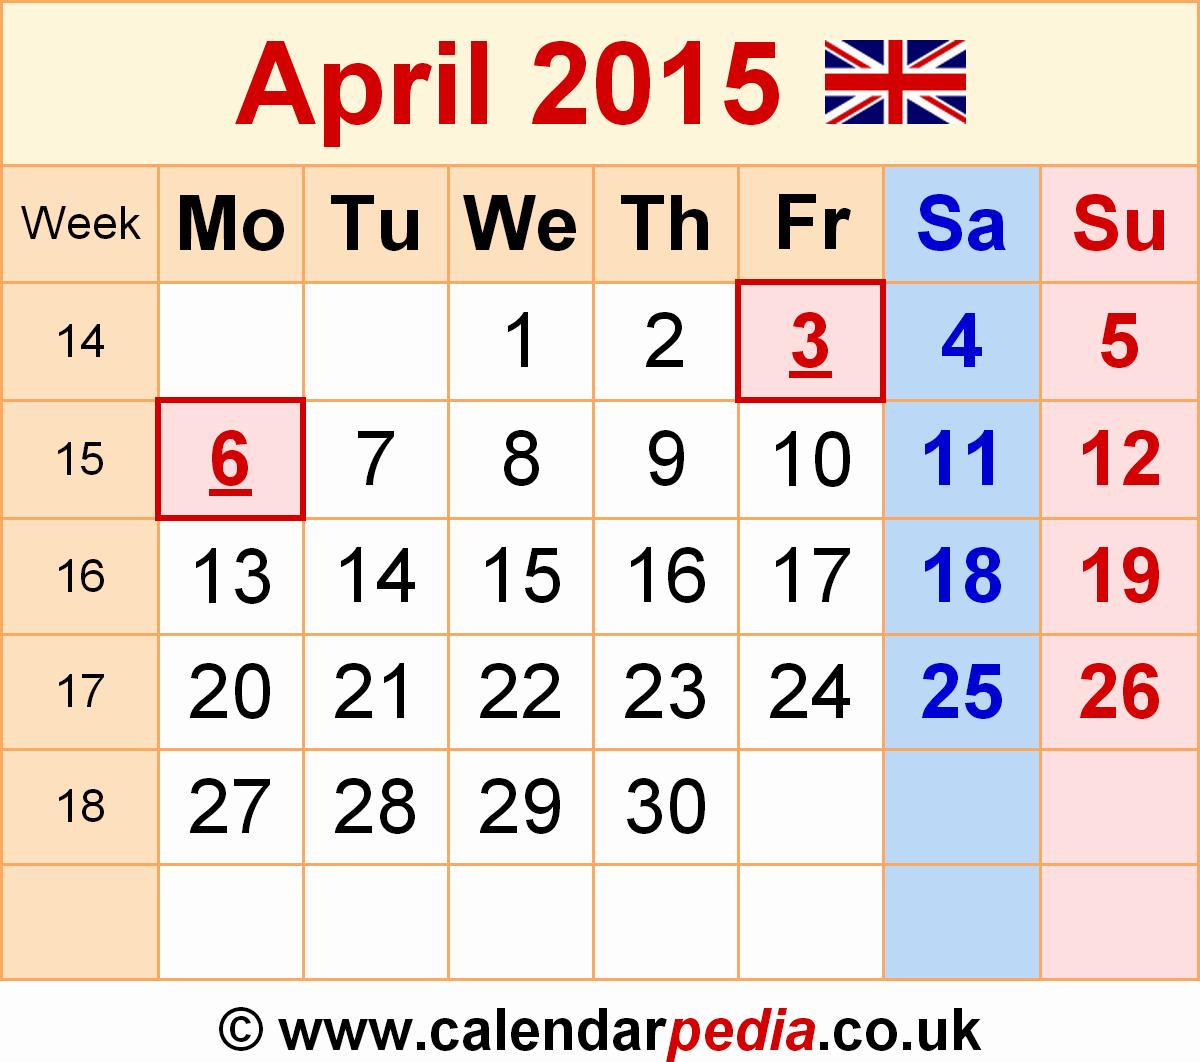 2015 Calendar with Holidays Excel Elegant Credit source Http Www Kalender 365 Nl Kalender 2015 Maart